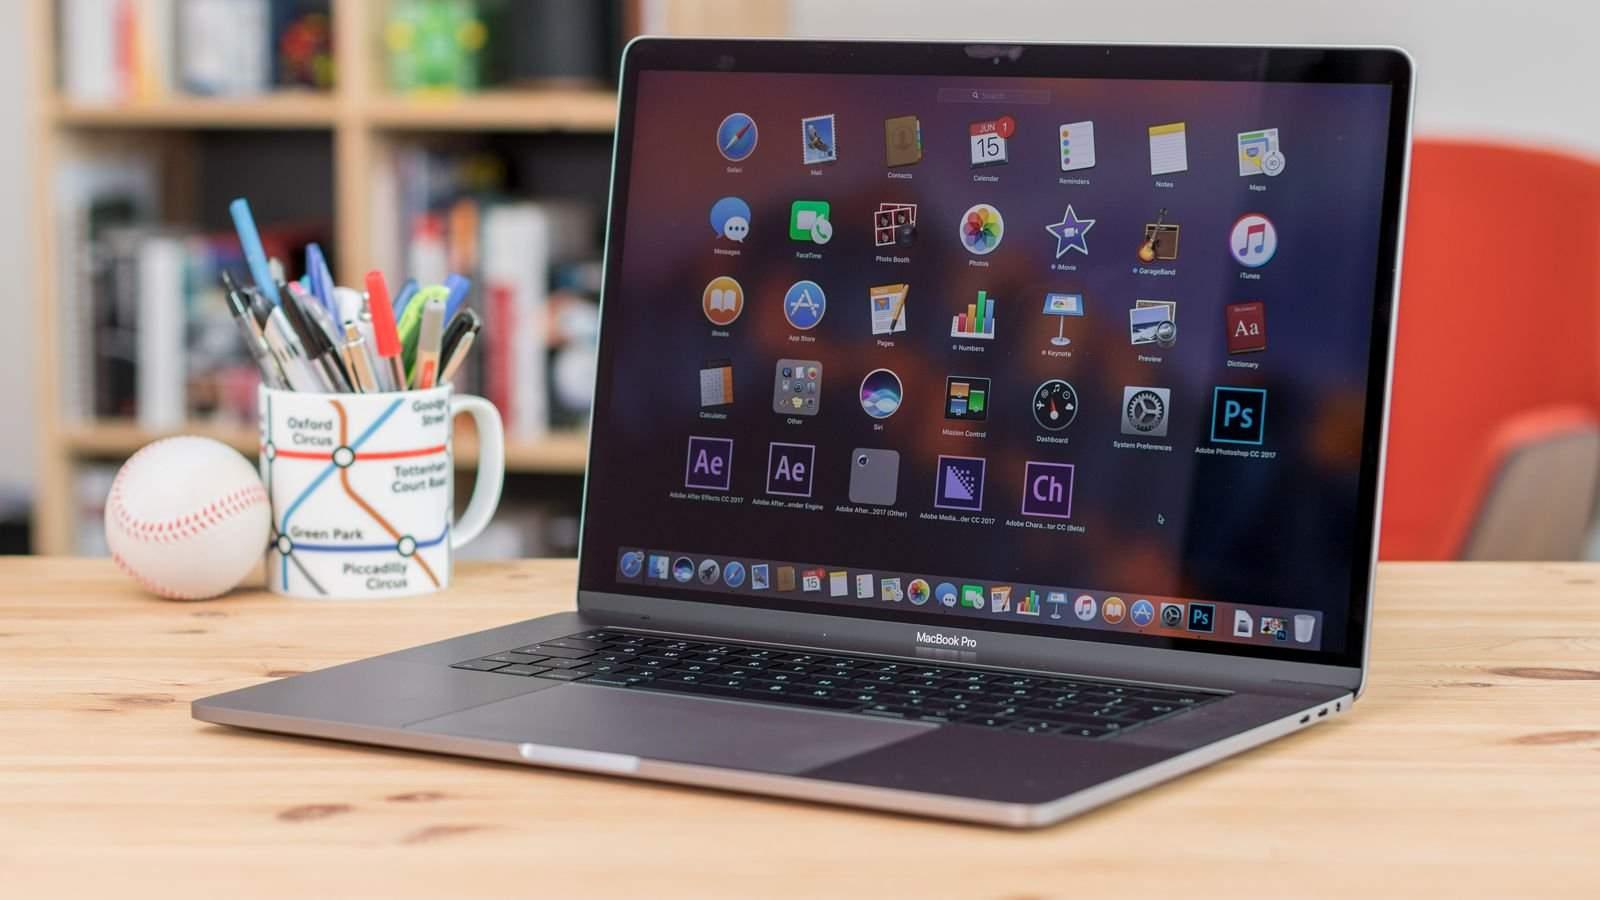 Обзор MacBook Pro 15 2017 года